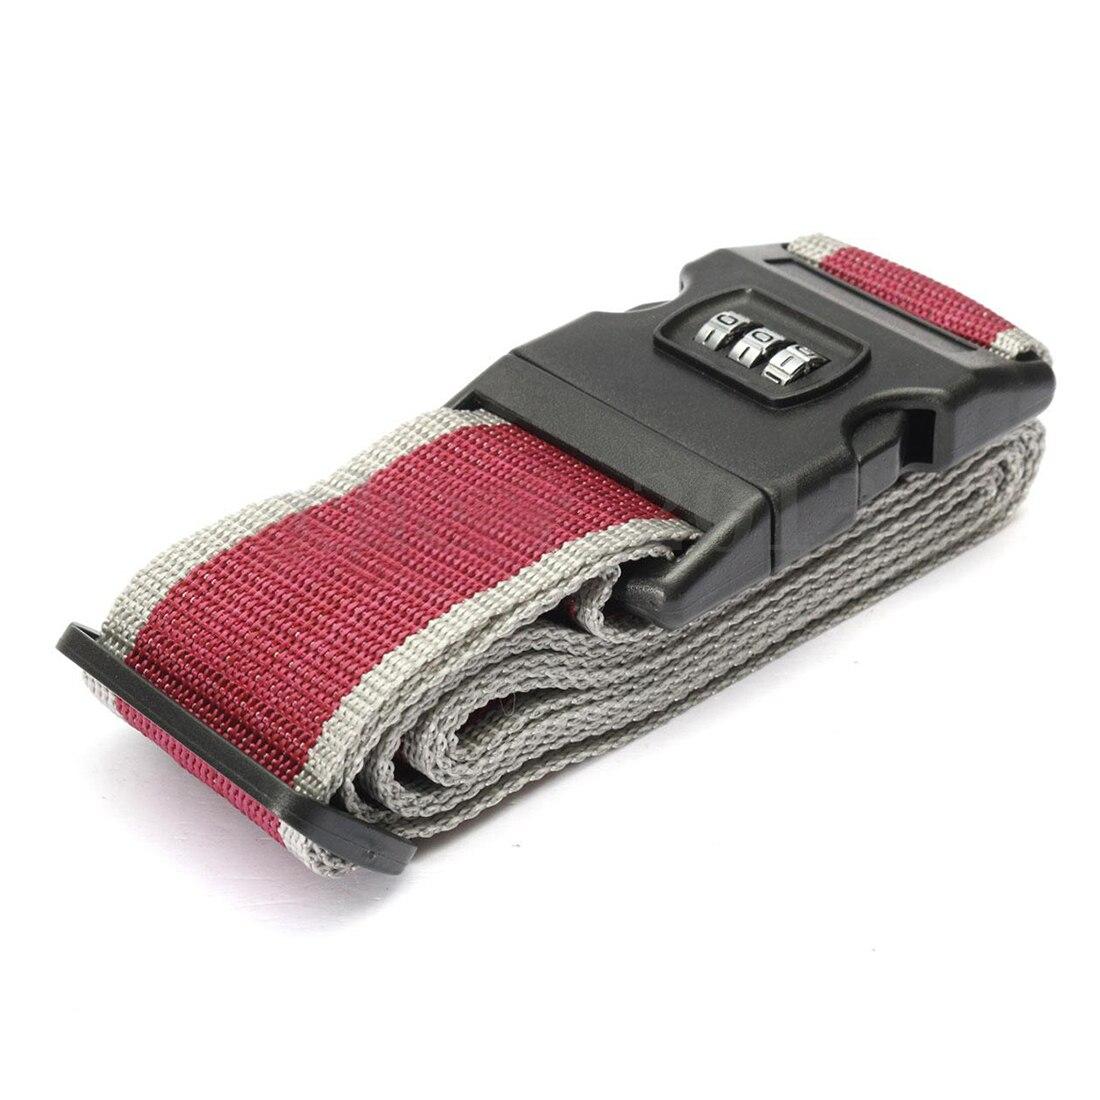 Safety belt Belt Lock Combination Travel luggage strap maritime safety